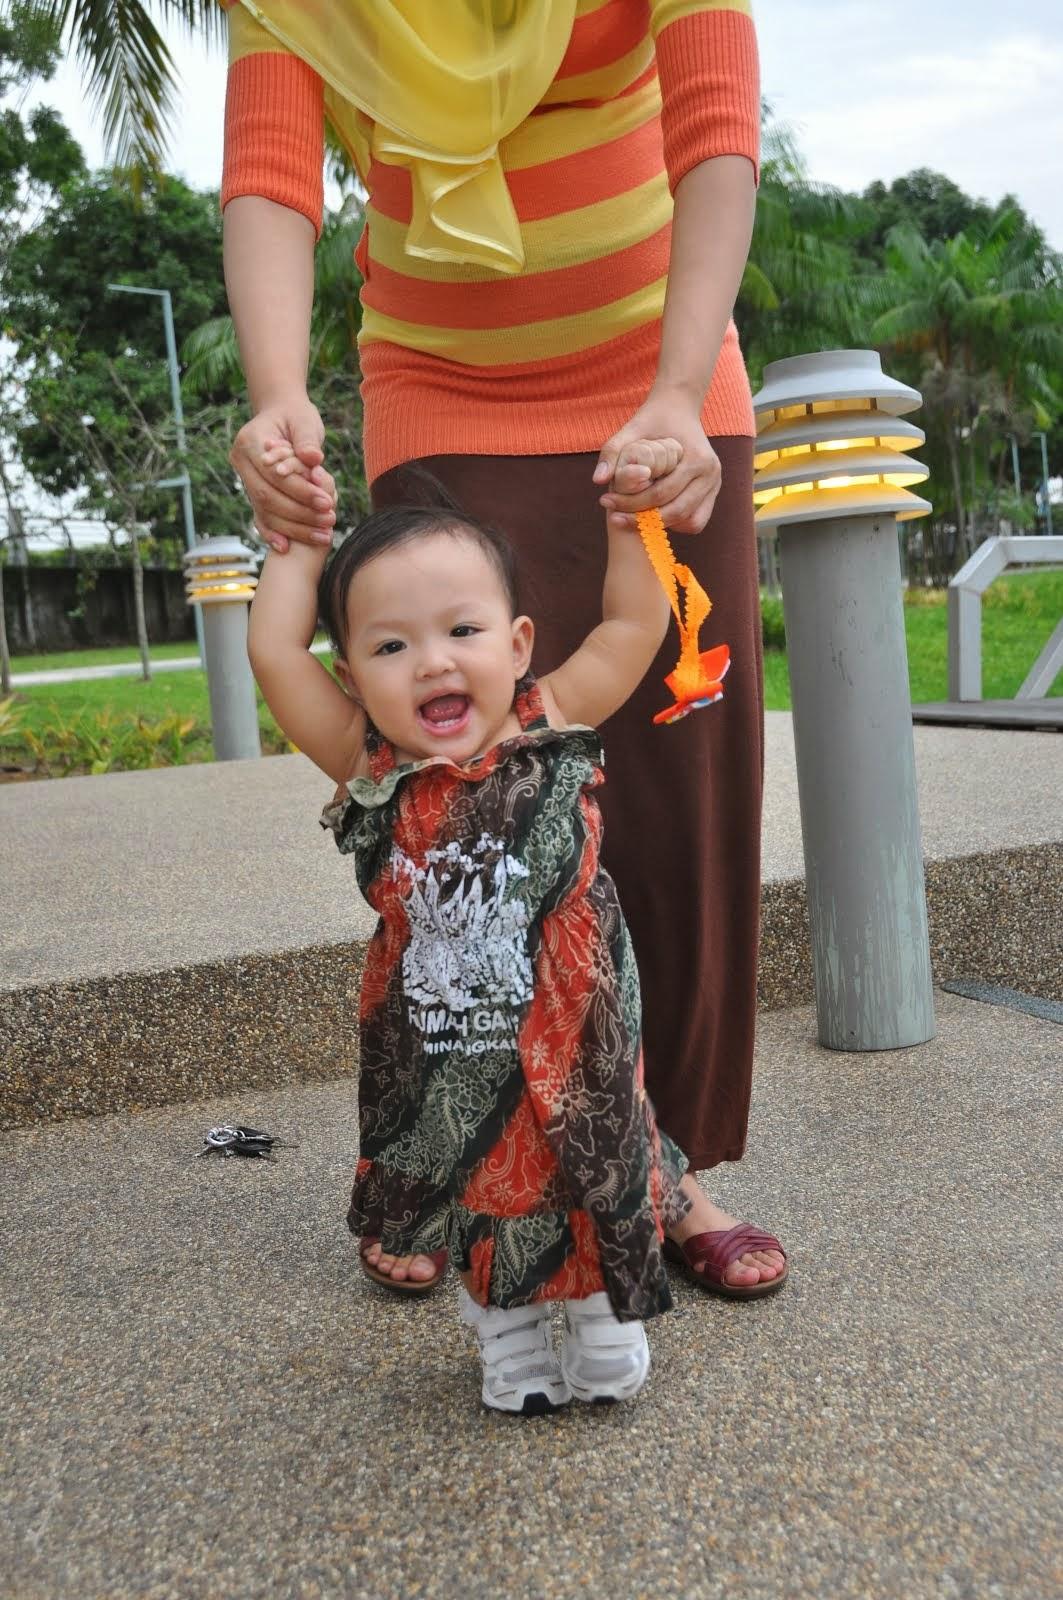 Firashaiyra Ihdina :: 1 Year 1 Month